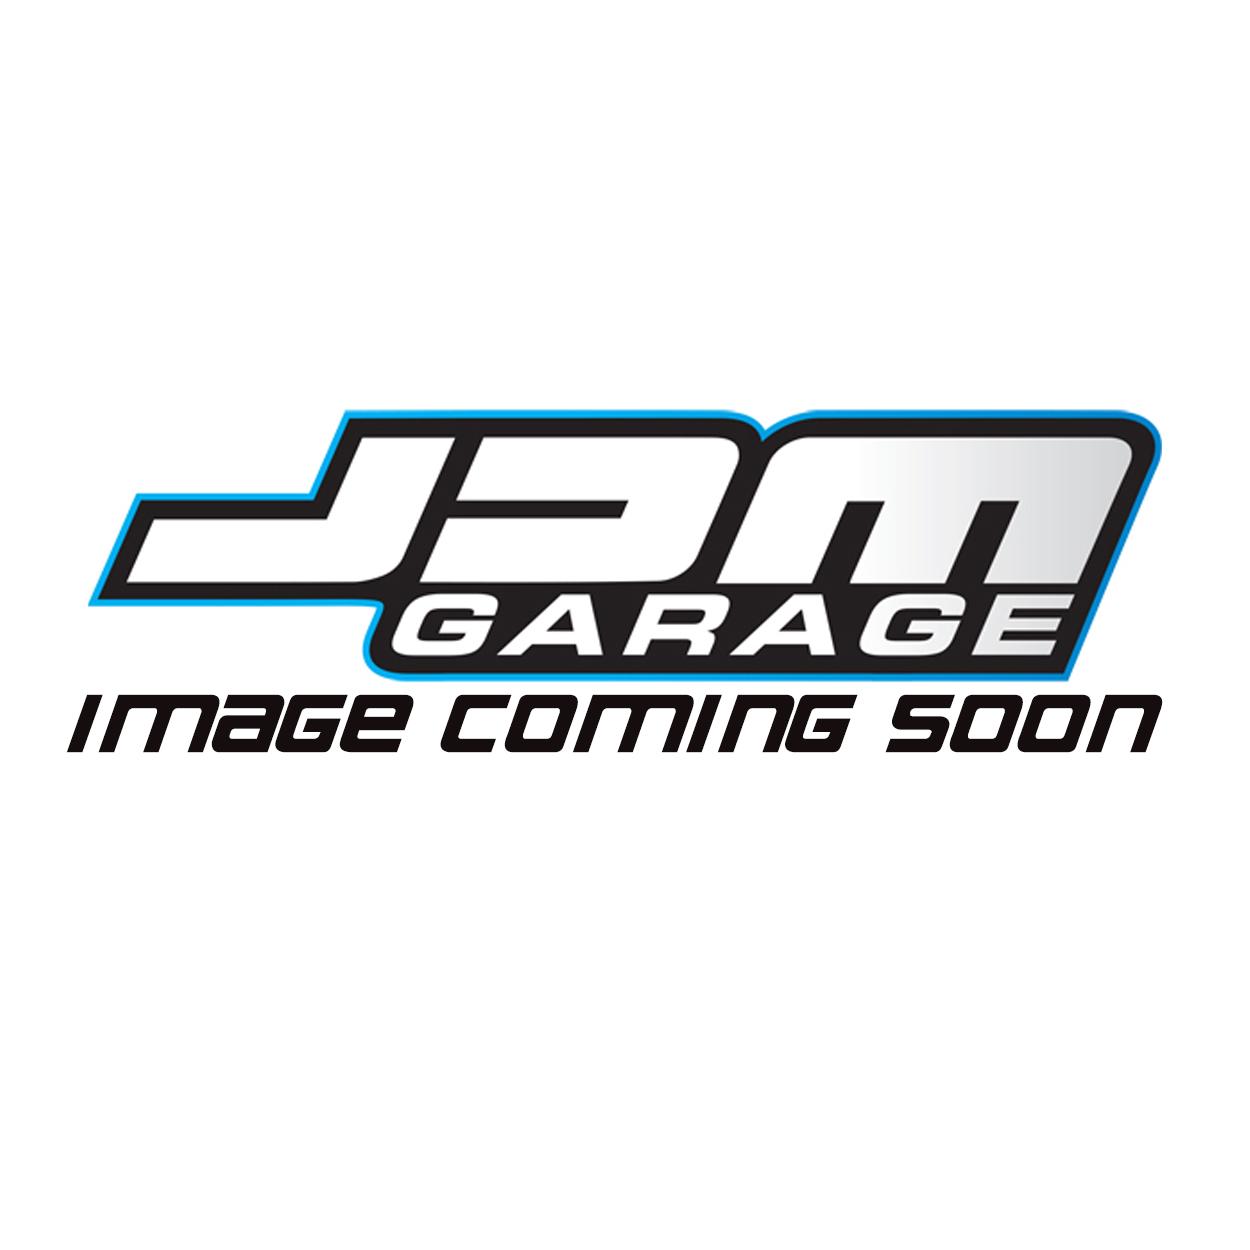 Xtreme Clutch & Flywheel - Organic / Ceramic / Carbon / Single & Twin Plate - Nissan Skyline R32 GTR RB26DETT Early model (Push Type)